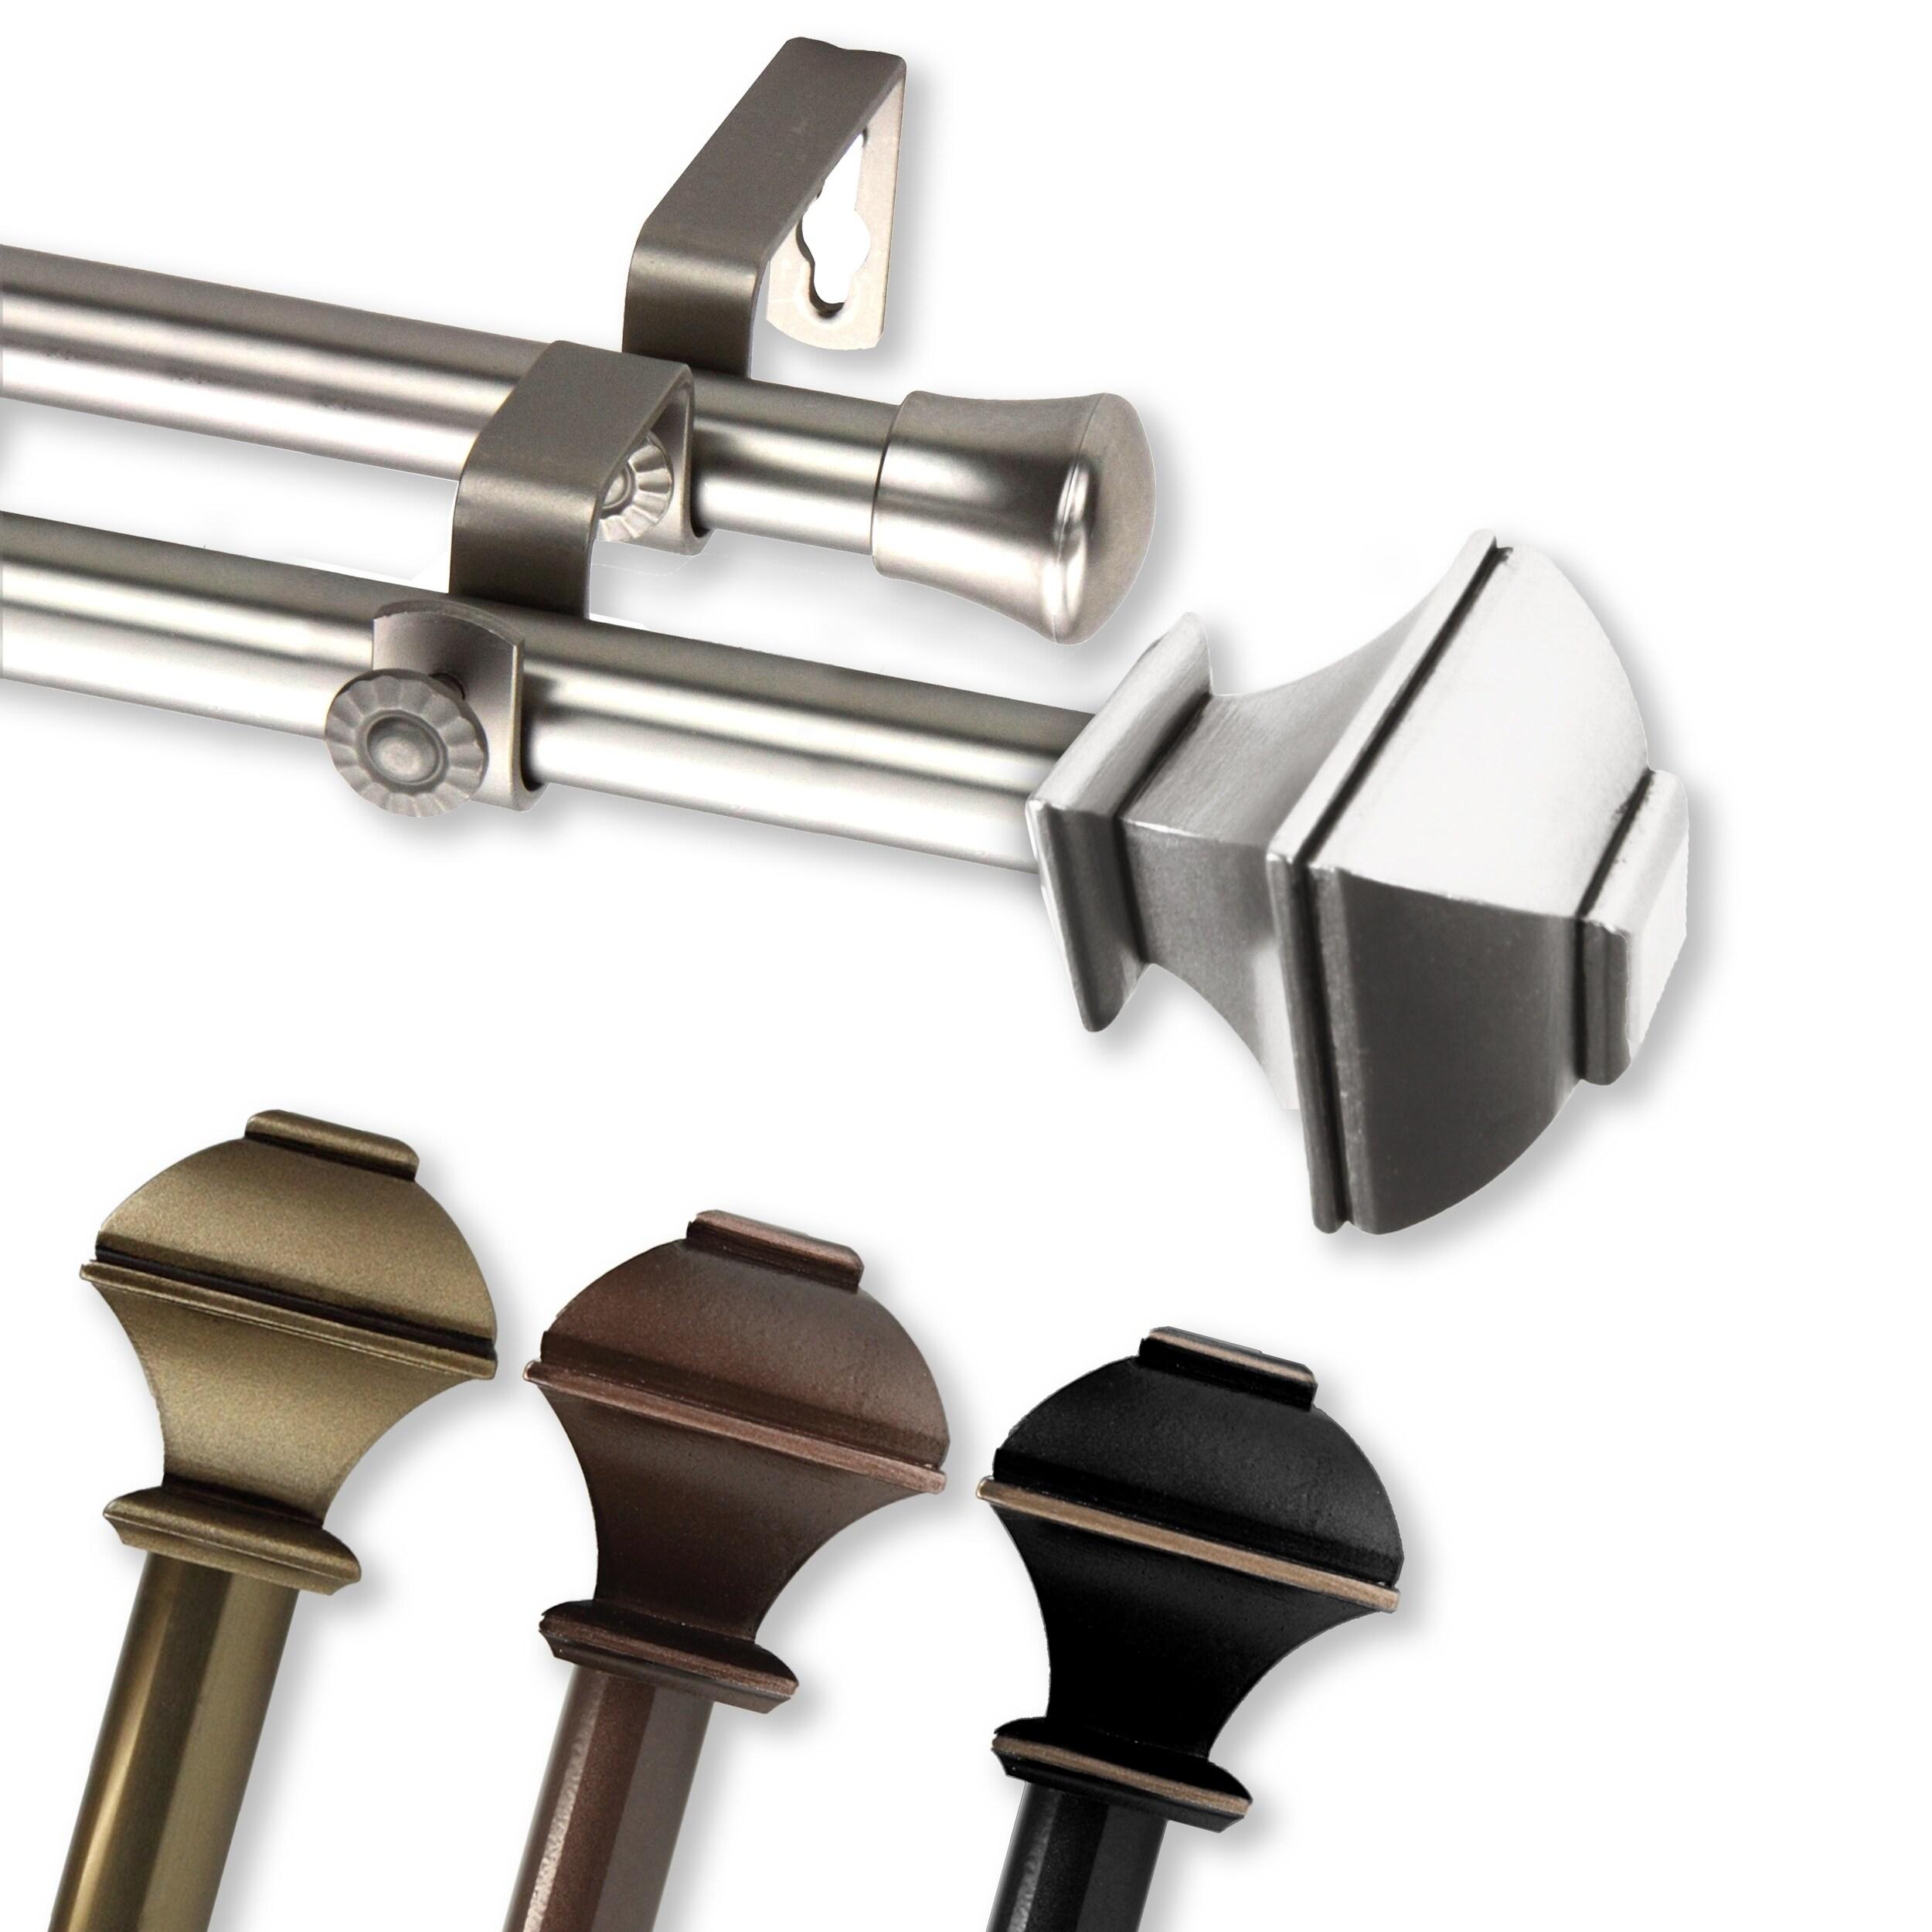 Shop Instyledesign Eugene Adjustable Double Curtain Rod On Sale